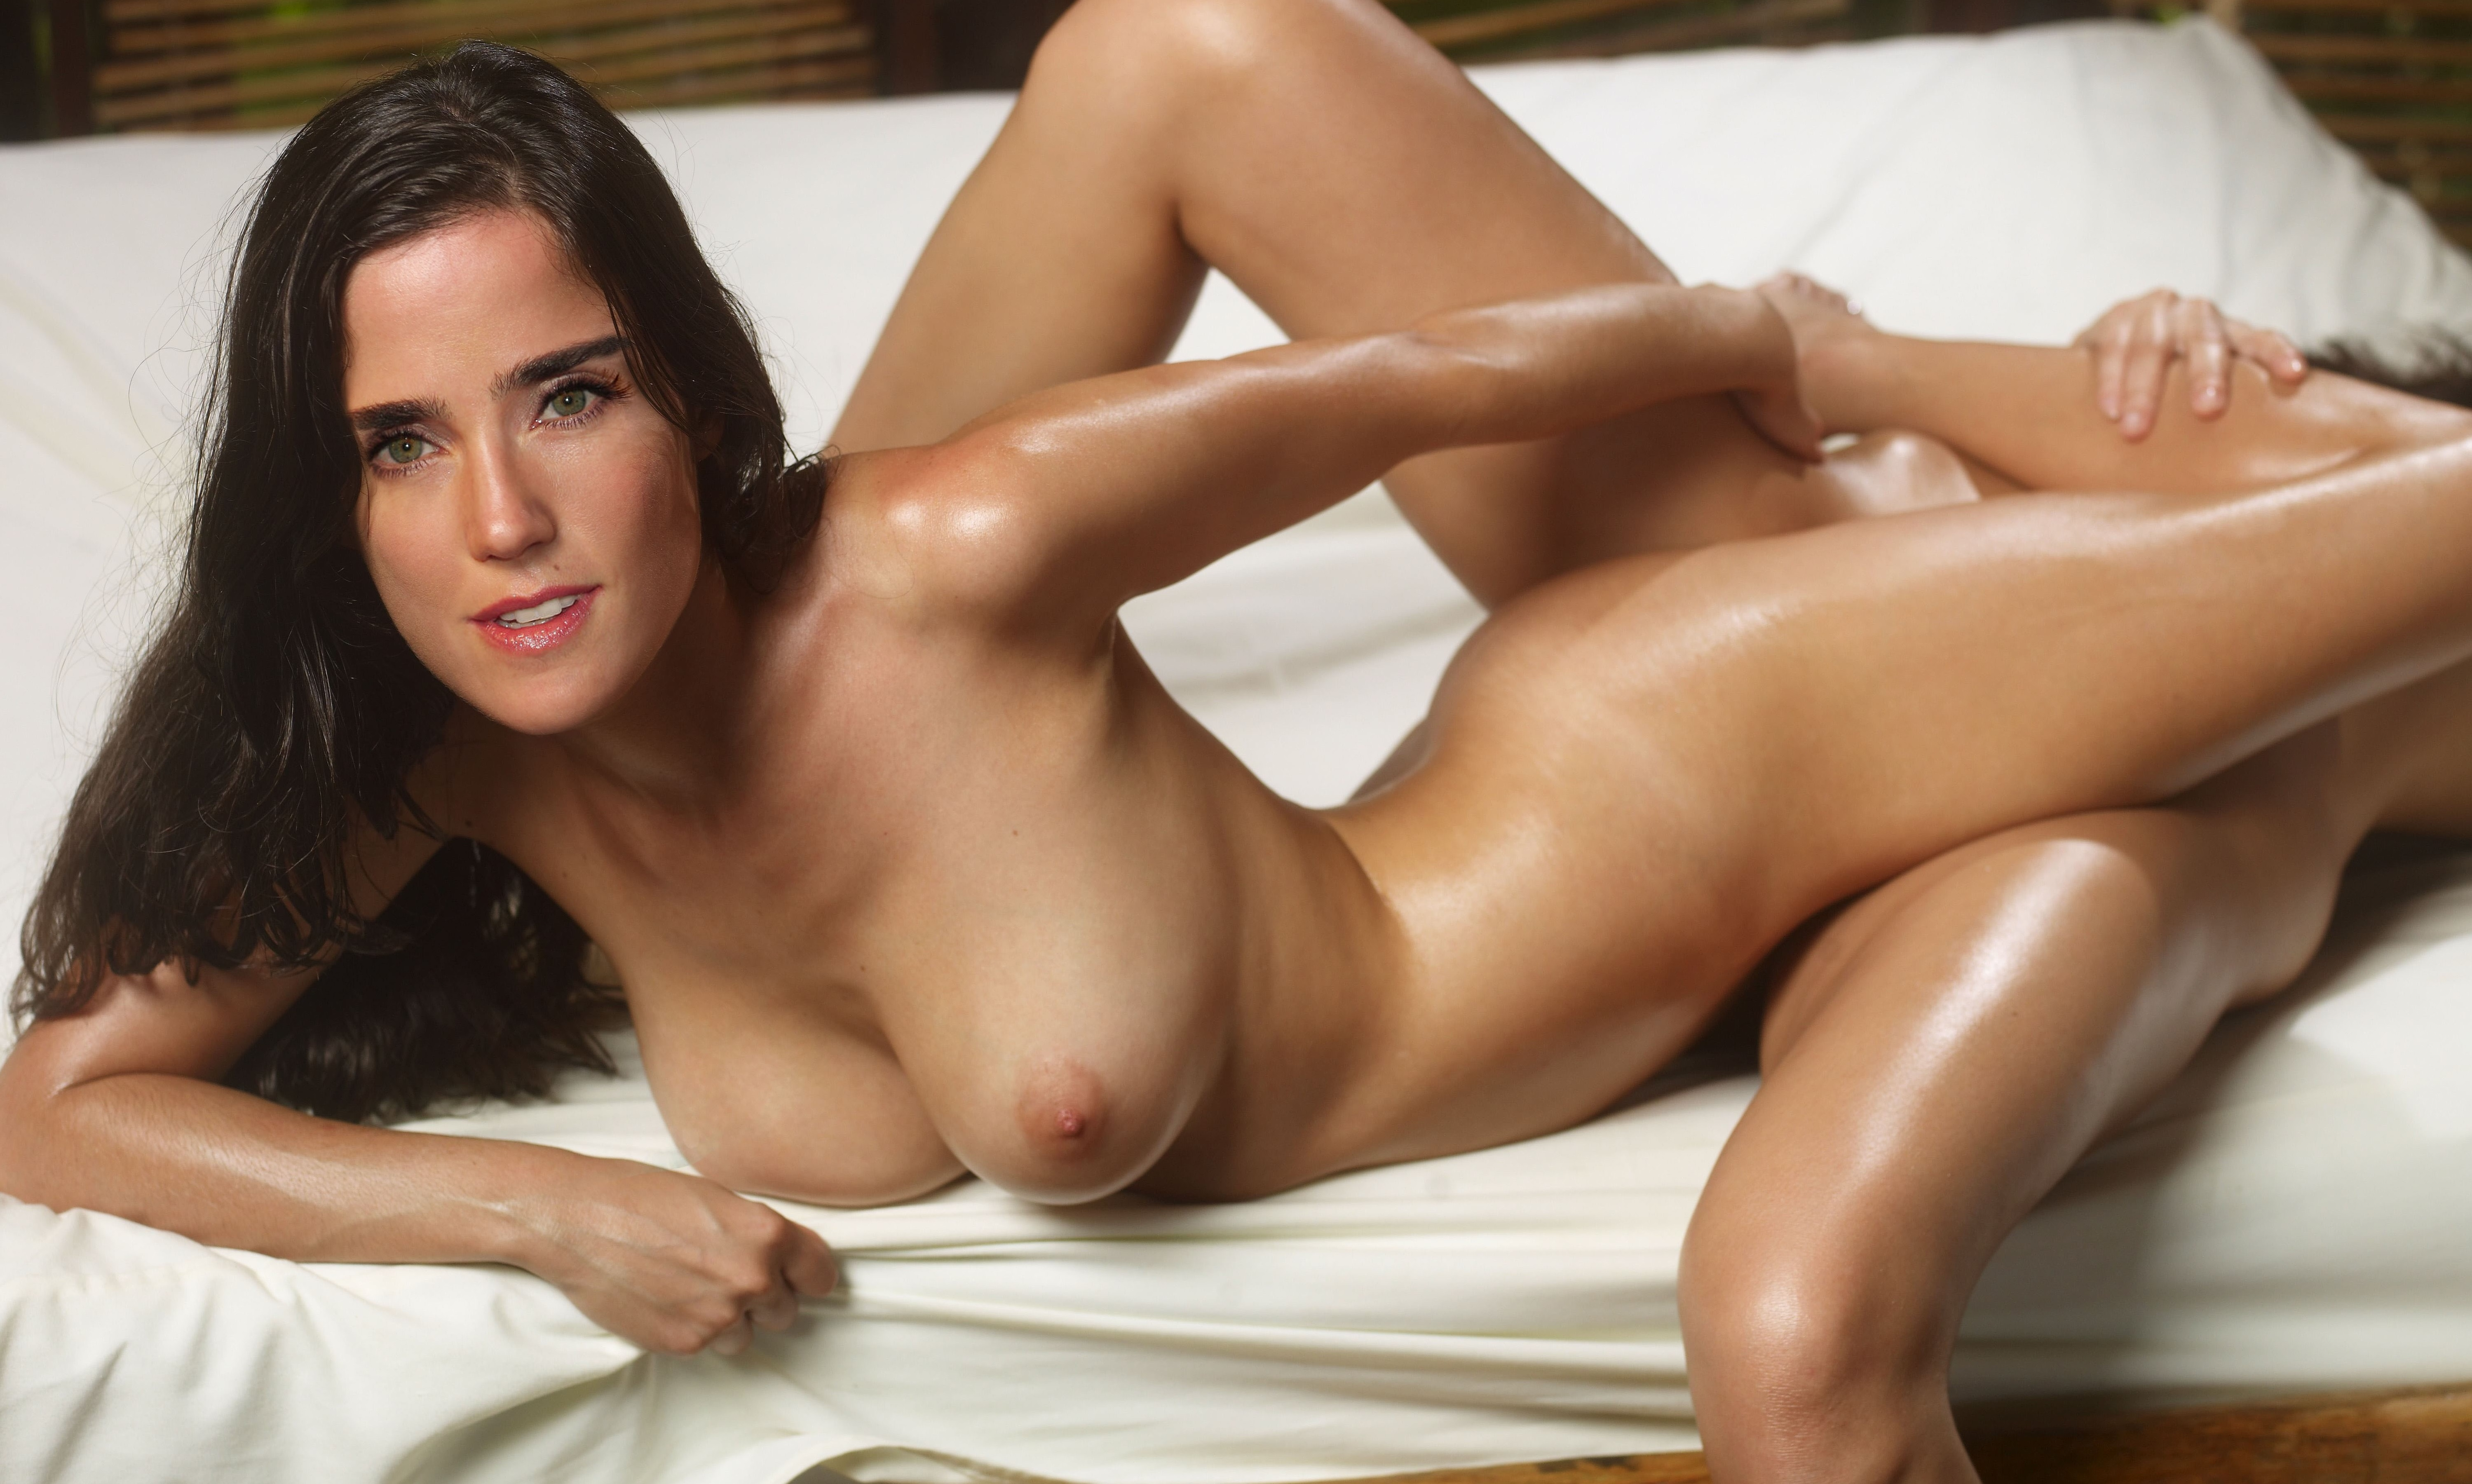 Amanda Auclair Naked hollywood actress nude wallpaper - megapornx